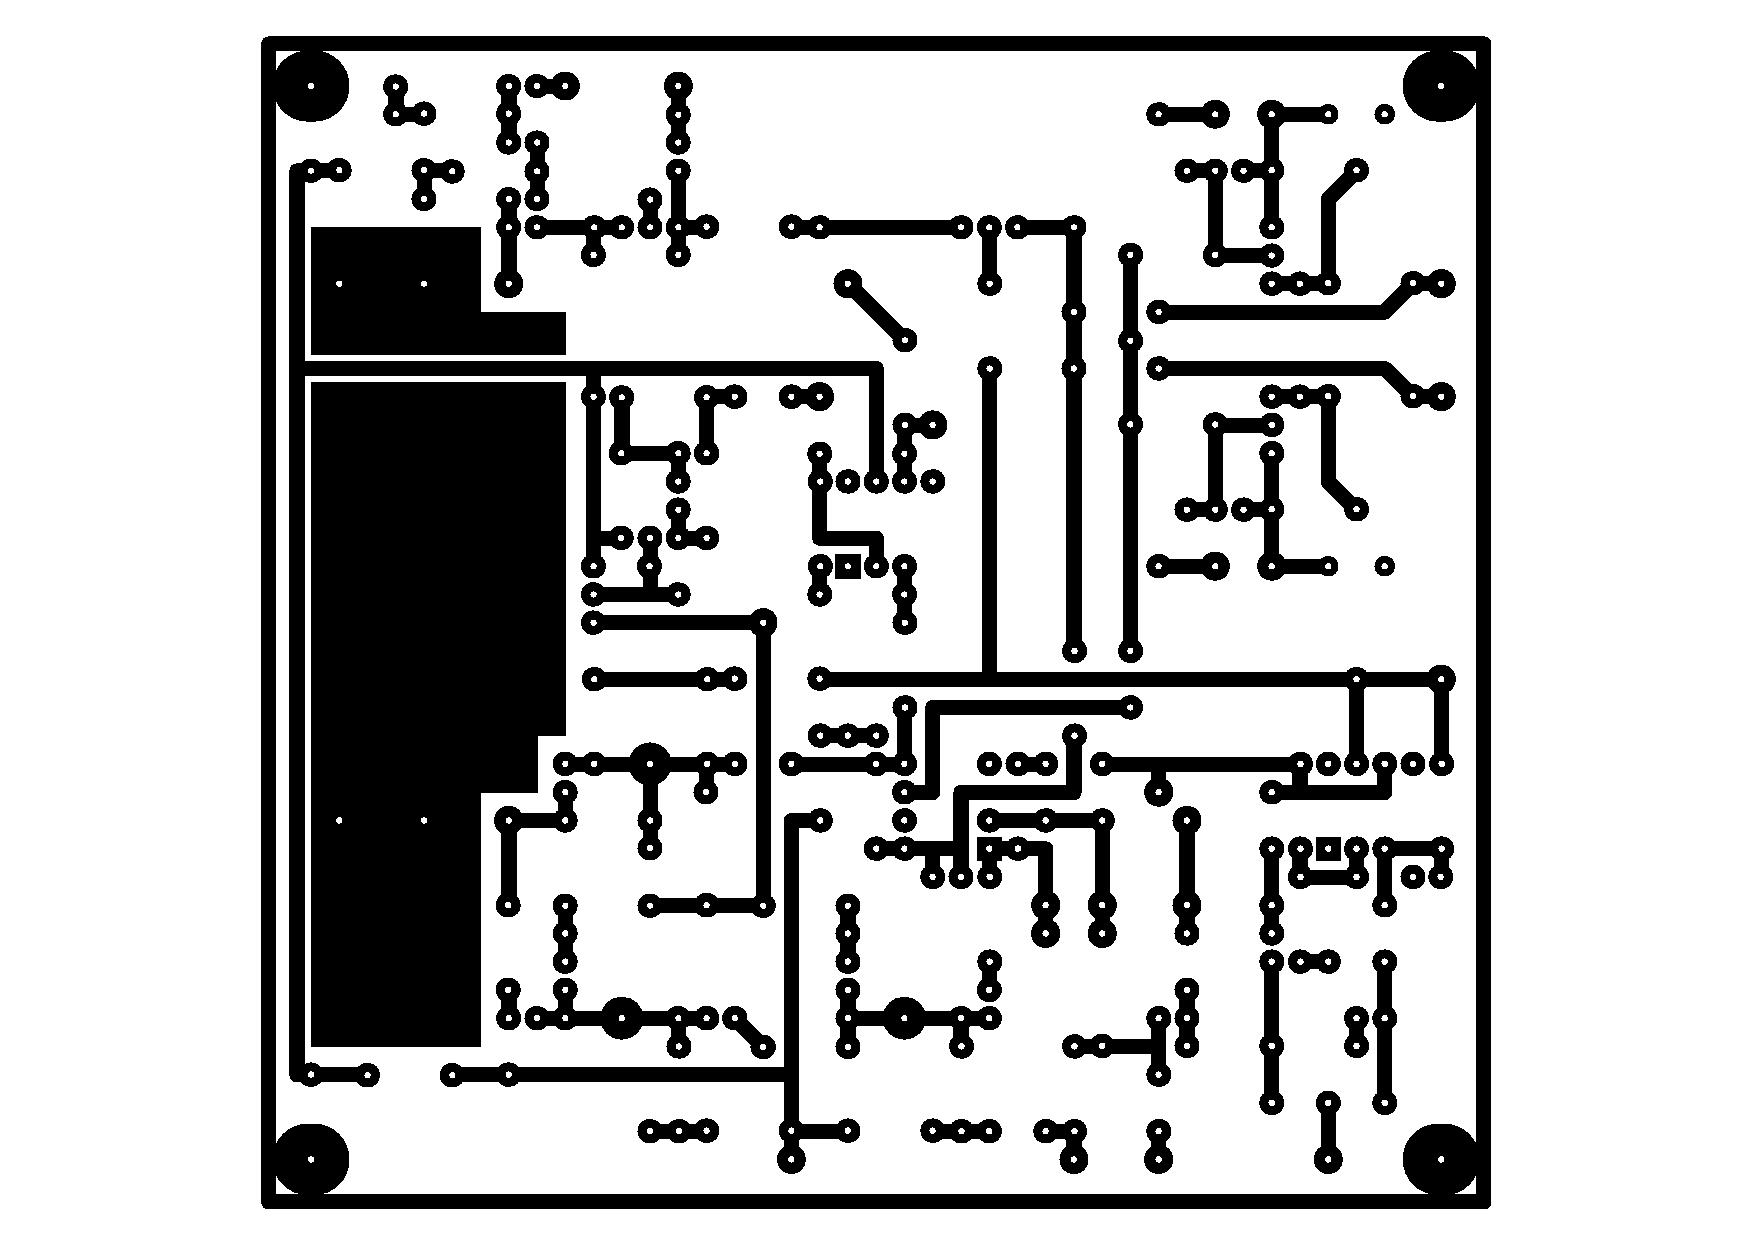 mixed signal transceiver